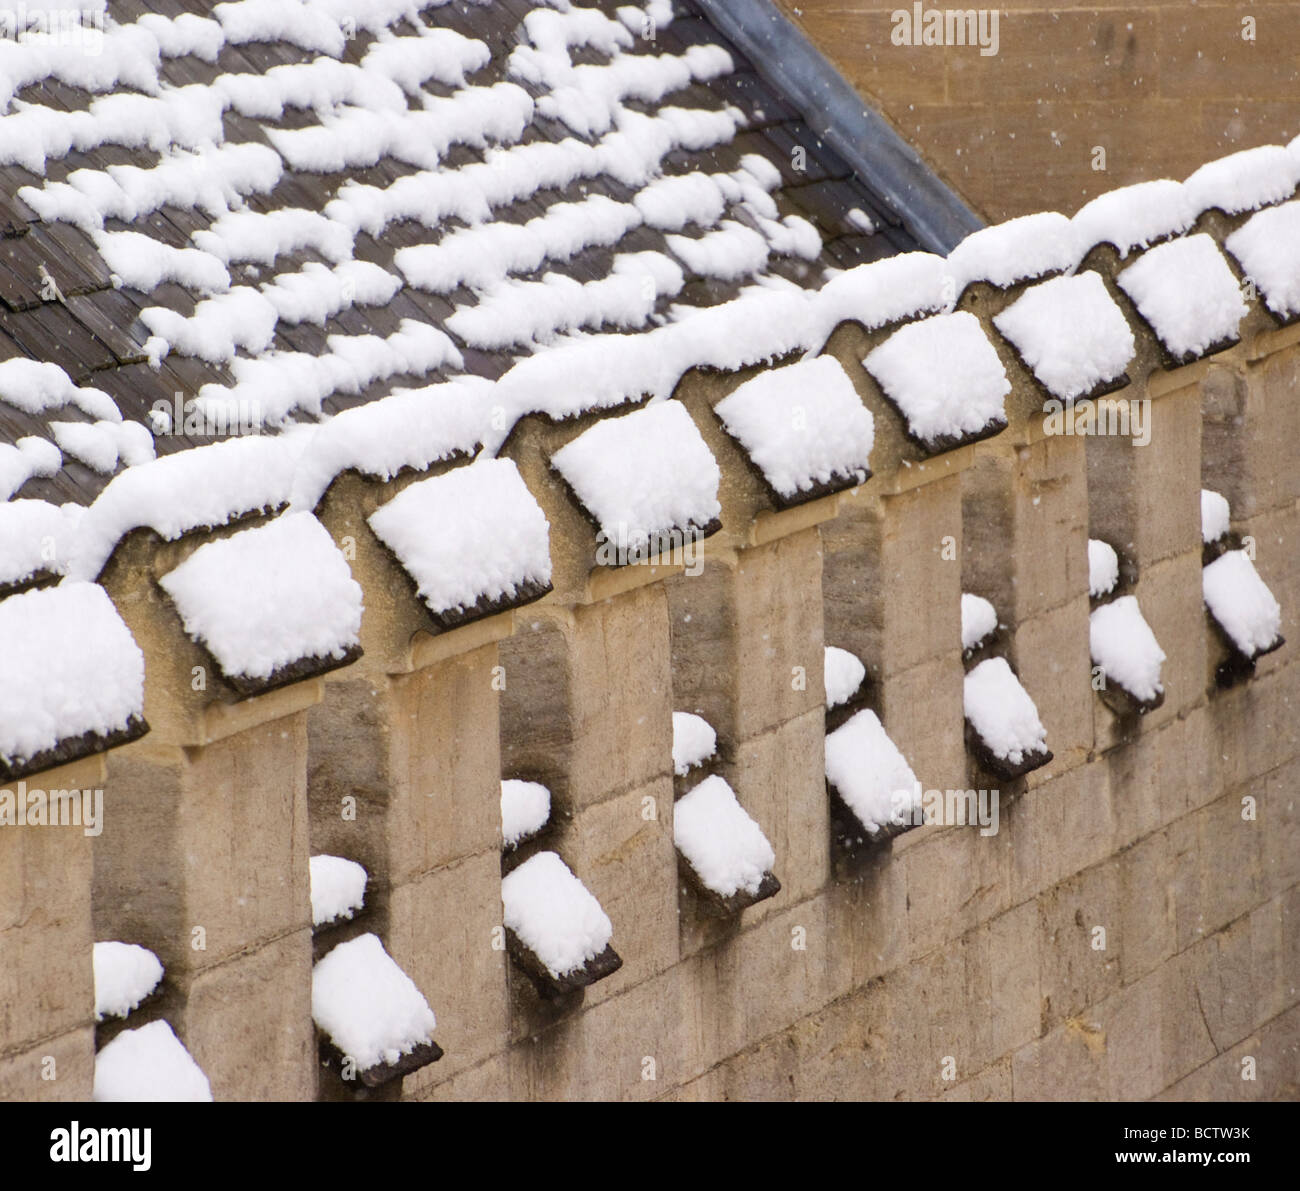 Jesus College rooftops in Snow, Oxford University - Stock Image